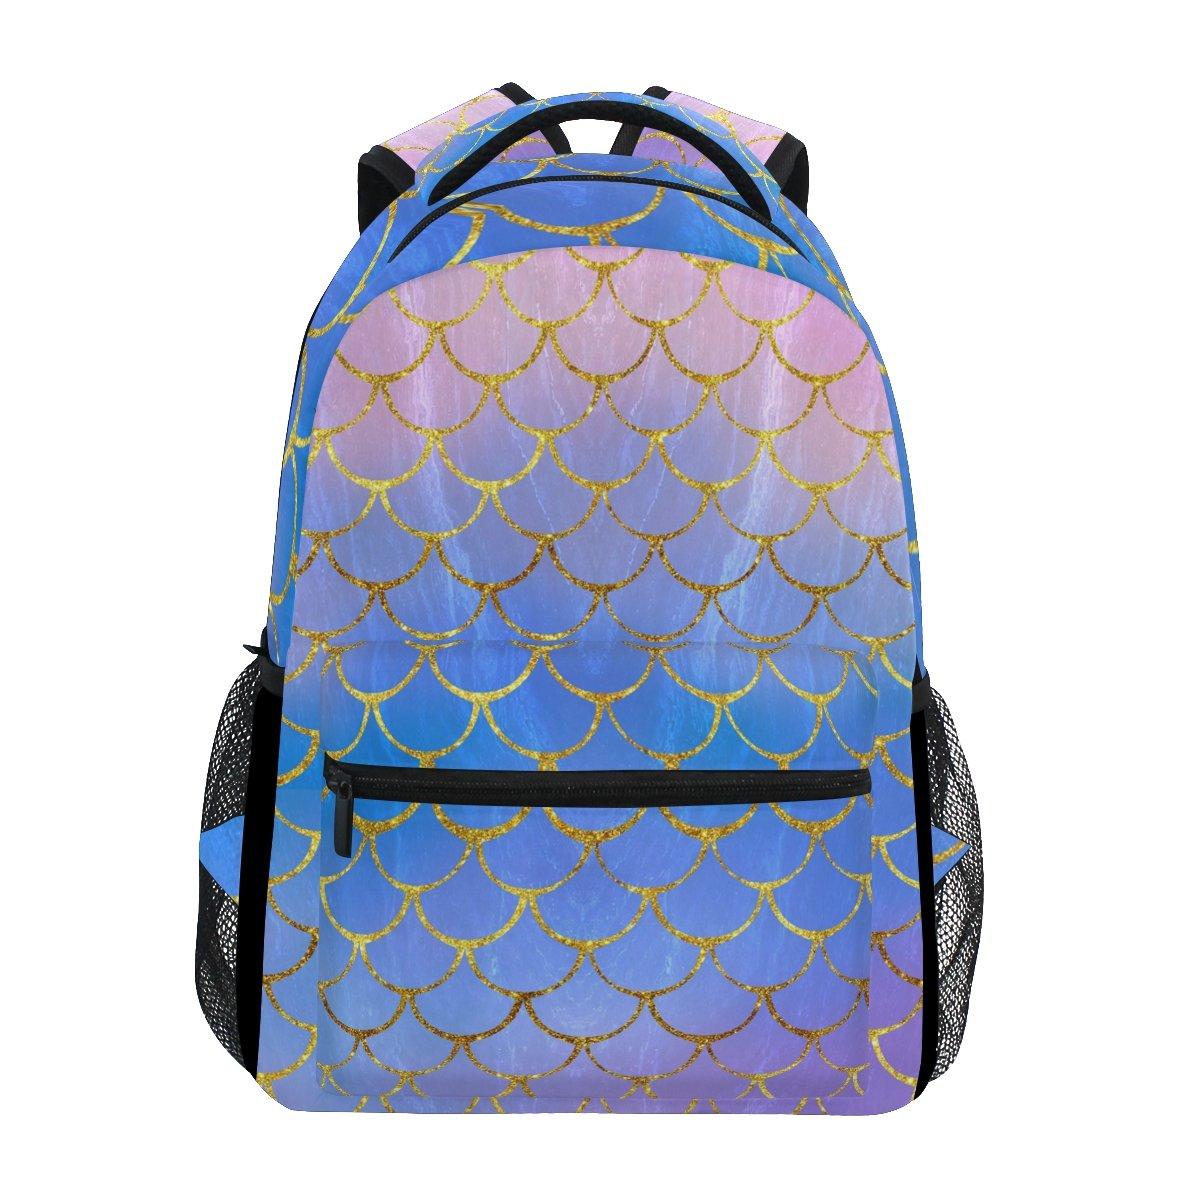 6e0a7d6ed58 ZOEO Girls Backpacks Purple Mermaid Scales Gold Marble Kids School Bookbags  Travel Laptop Daypack Bag Purse for Teens Women